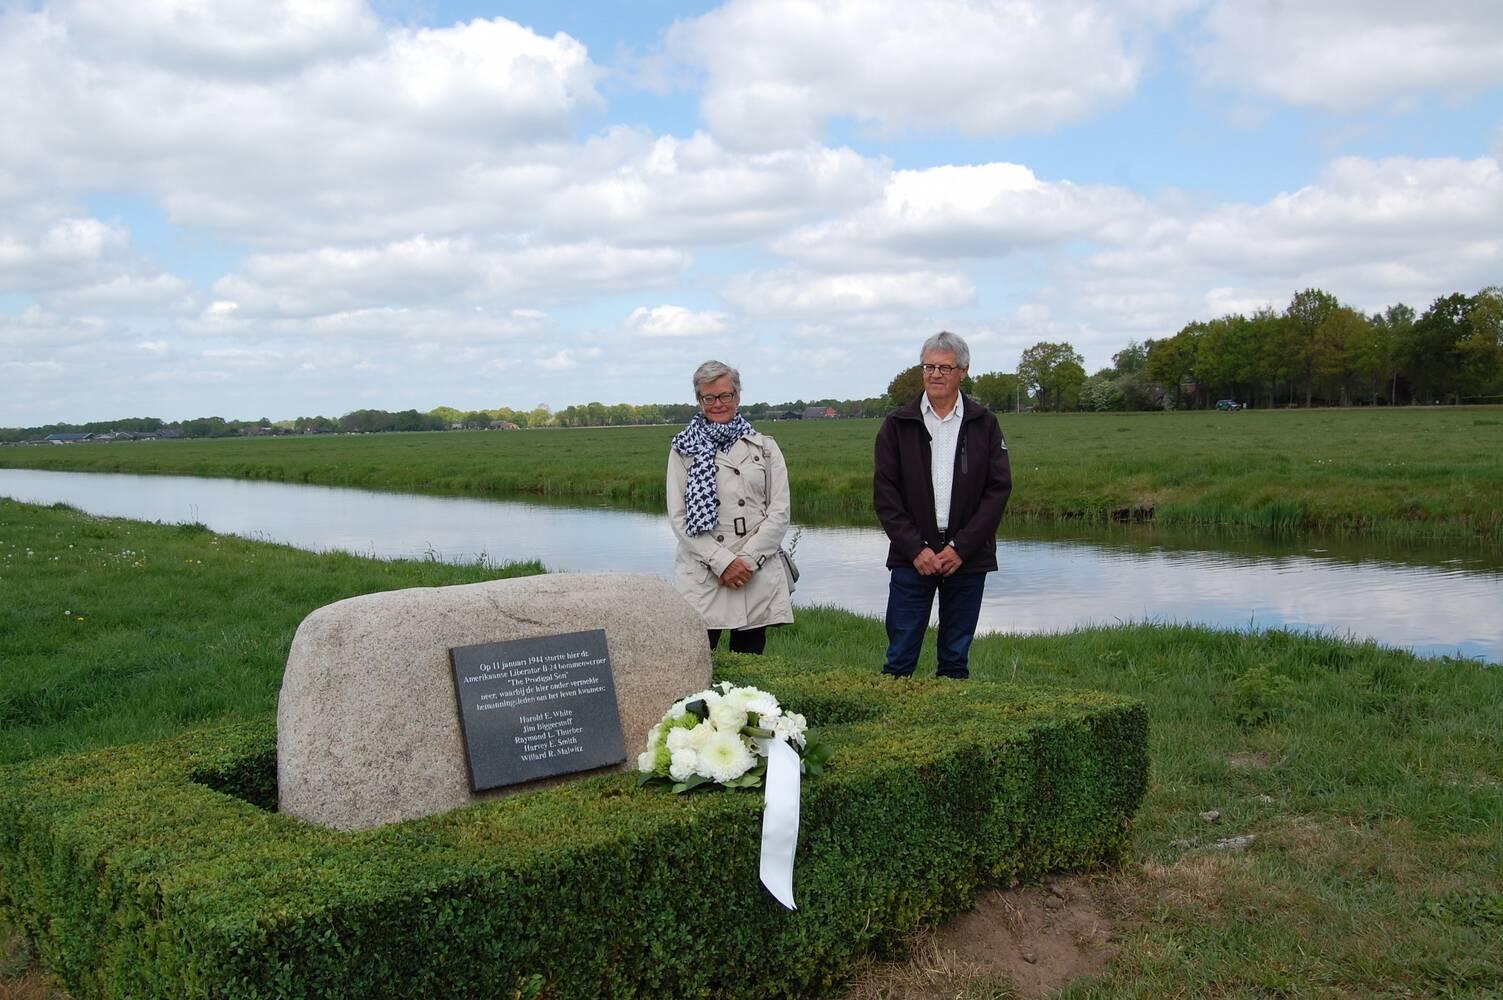 Dwingels Eigen herdenkt oorlogslachtoffers WO II